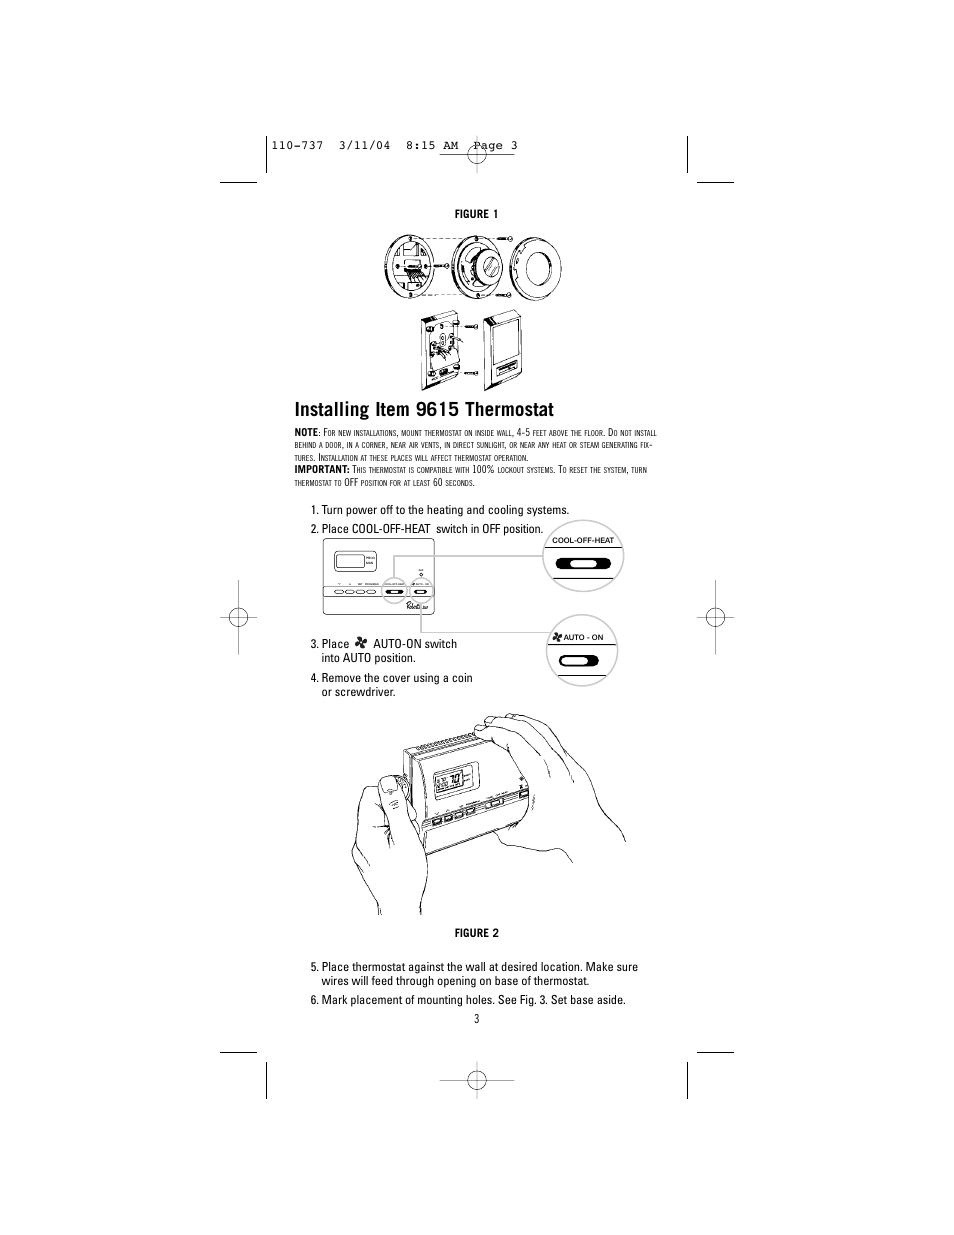 medium resolution of installing item 9615 thermostat robertshaw 9615 user manual page robertshaw thermostat 9520 manual robertshaw 9615 thermostat wiring diagram